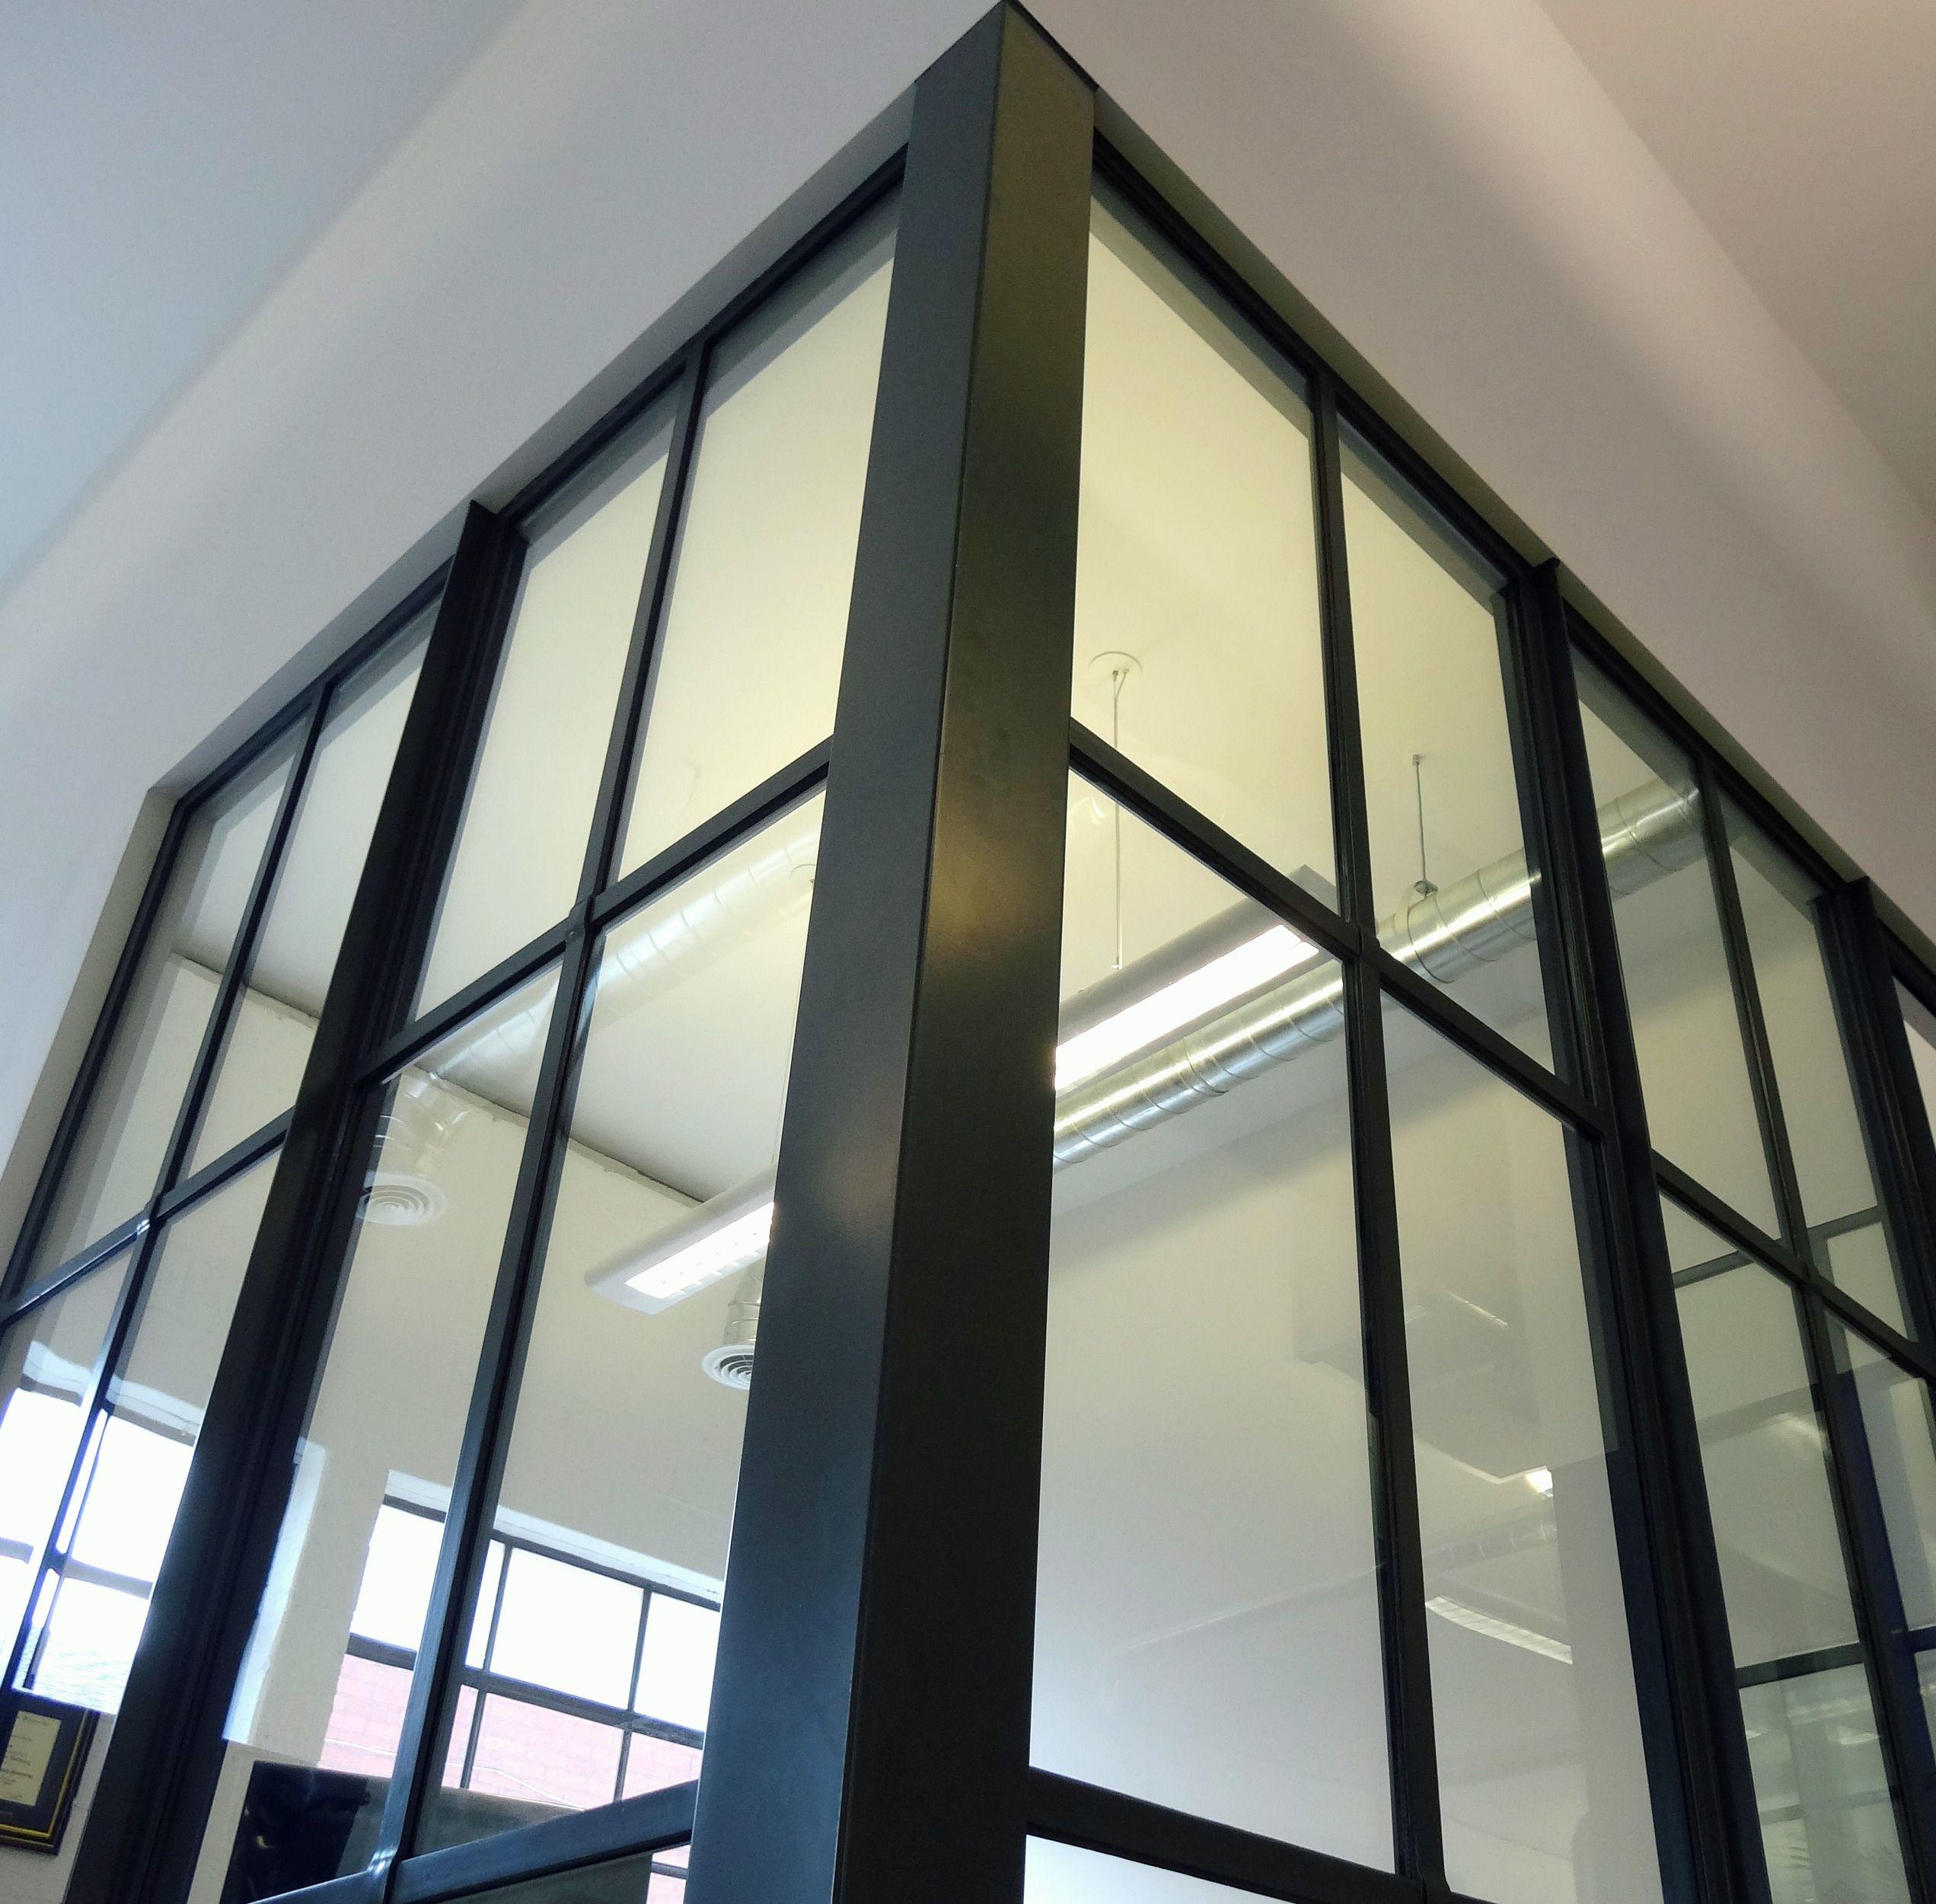 Steel Fixed Windows : Upward facing view of fixed steel window system closing